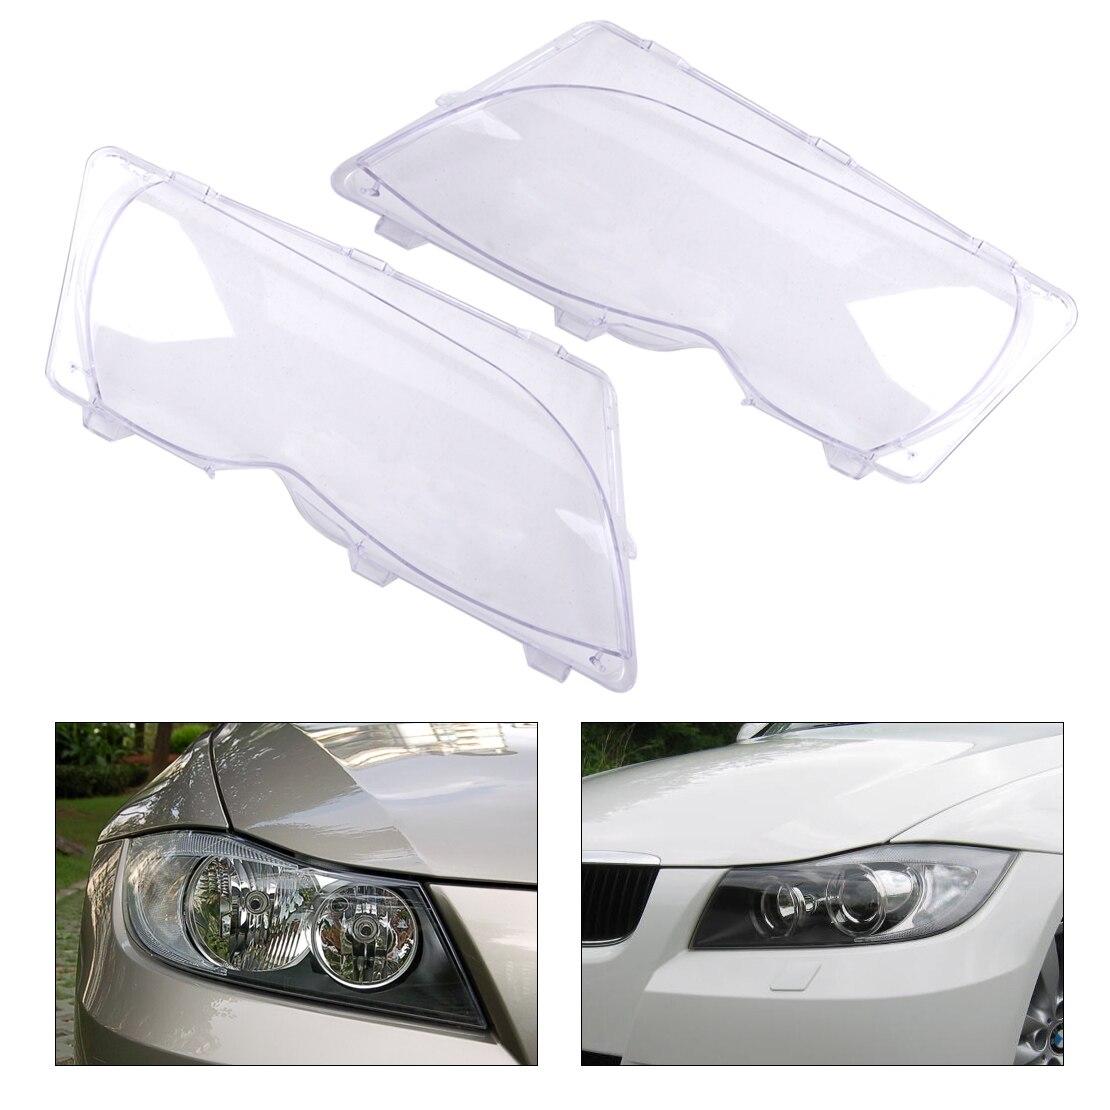 CITALL 63126924045 63126924046 2pcs Clear Headlight Lamp Lens Cover for BMW 3 Series E46 325i 325xi